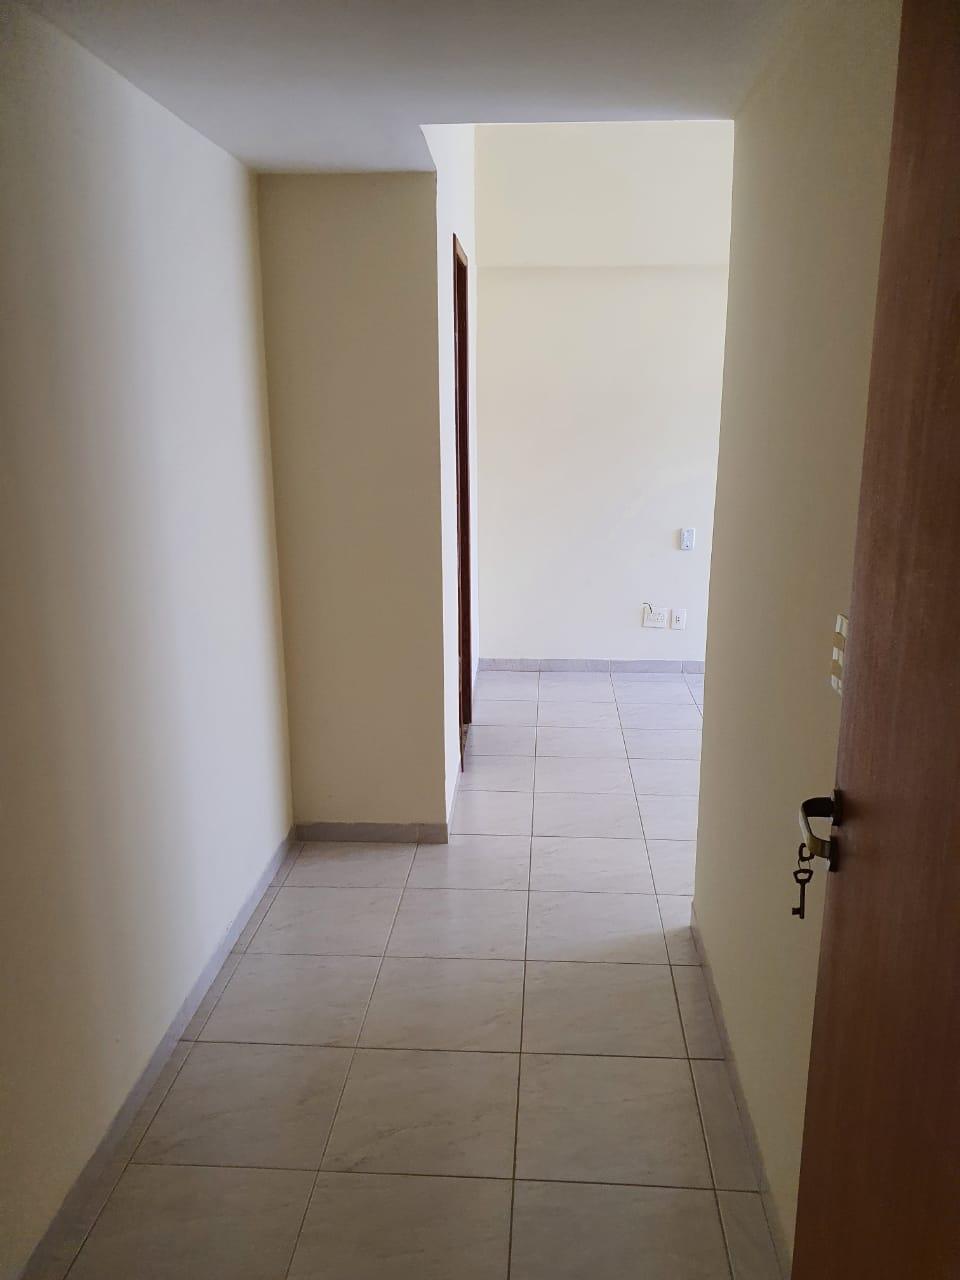 Residencial lilian 209 05